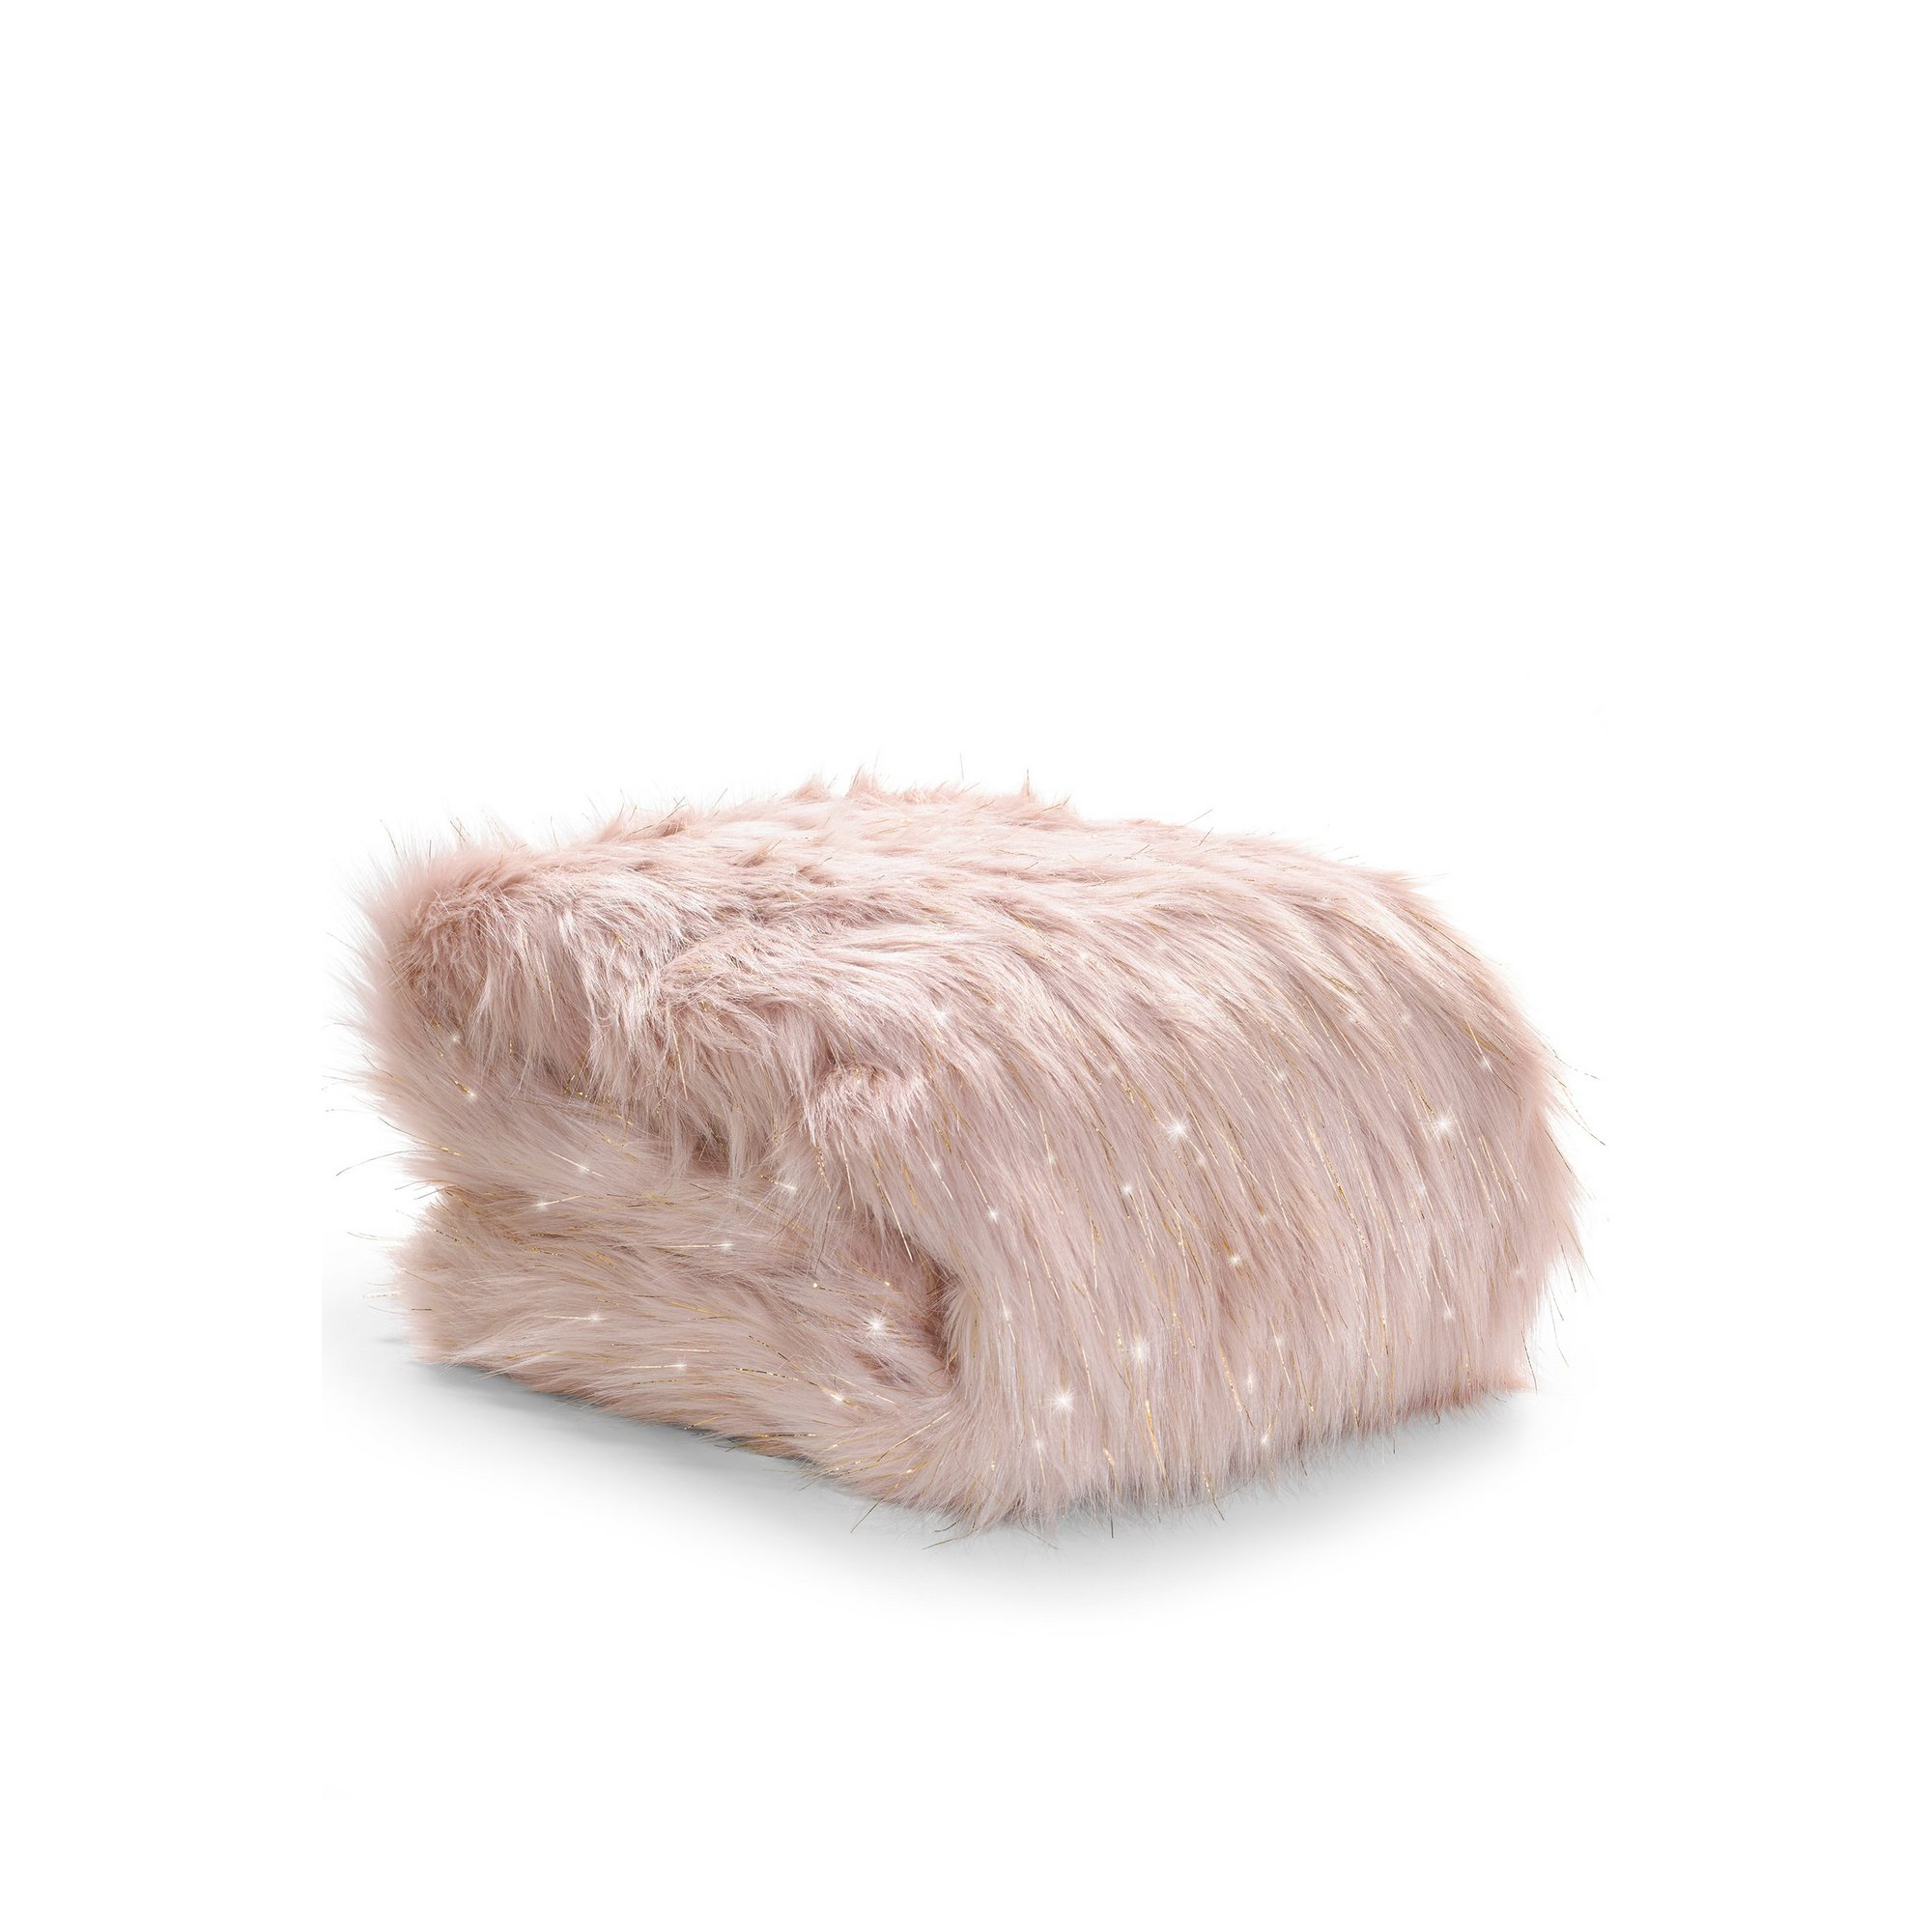 Image of Catherine Lansfield Metallic Fur Throw